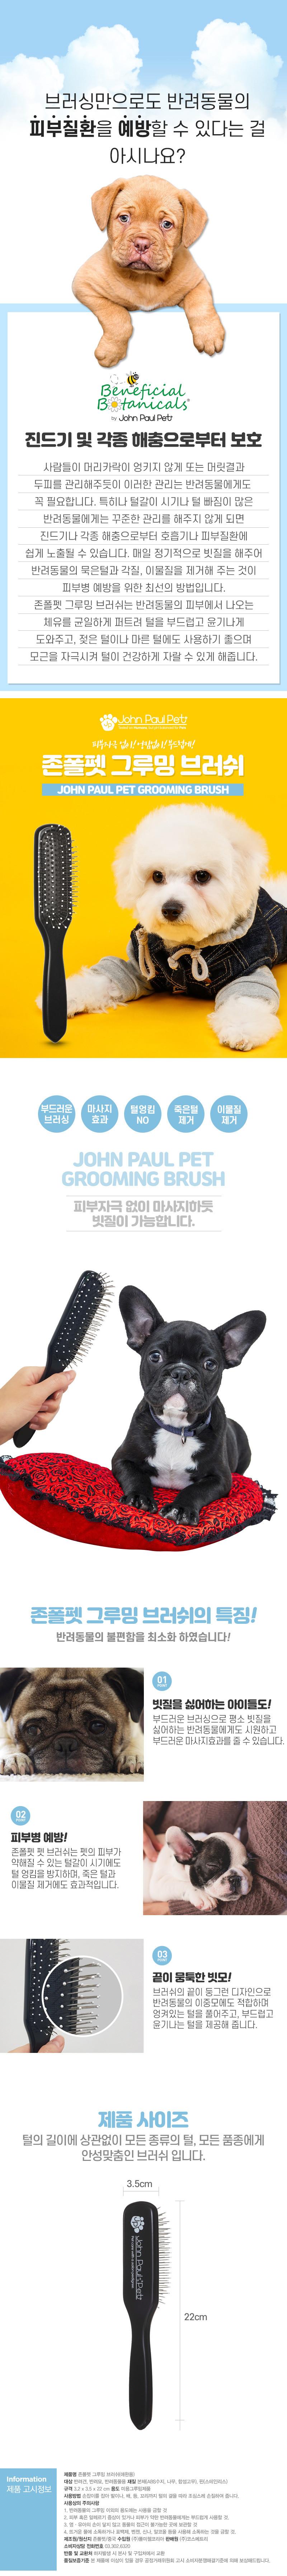 johnpaulpet_grooming_brush_800.jpg